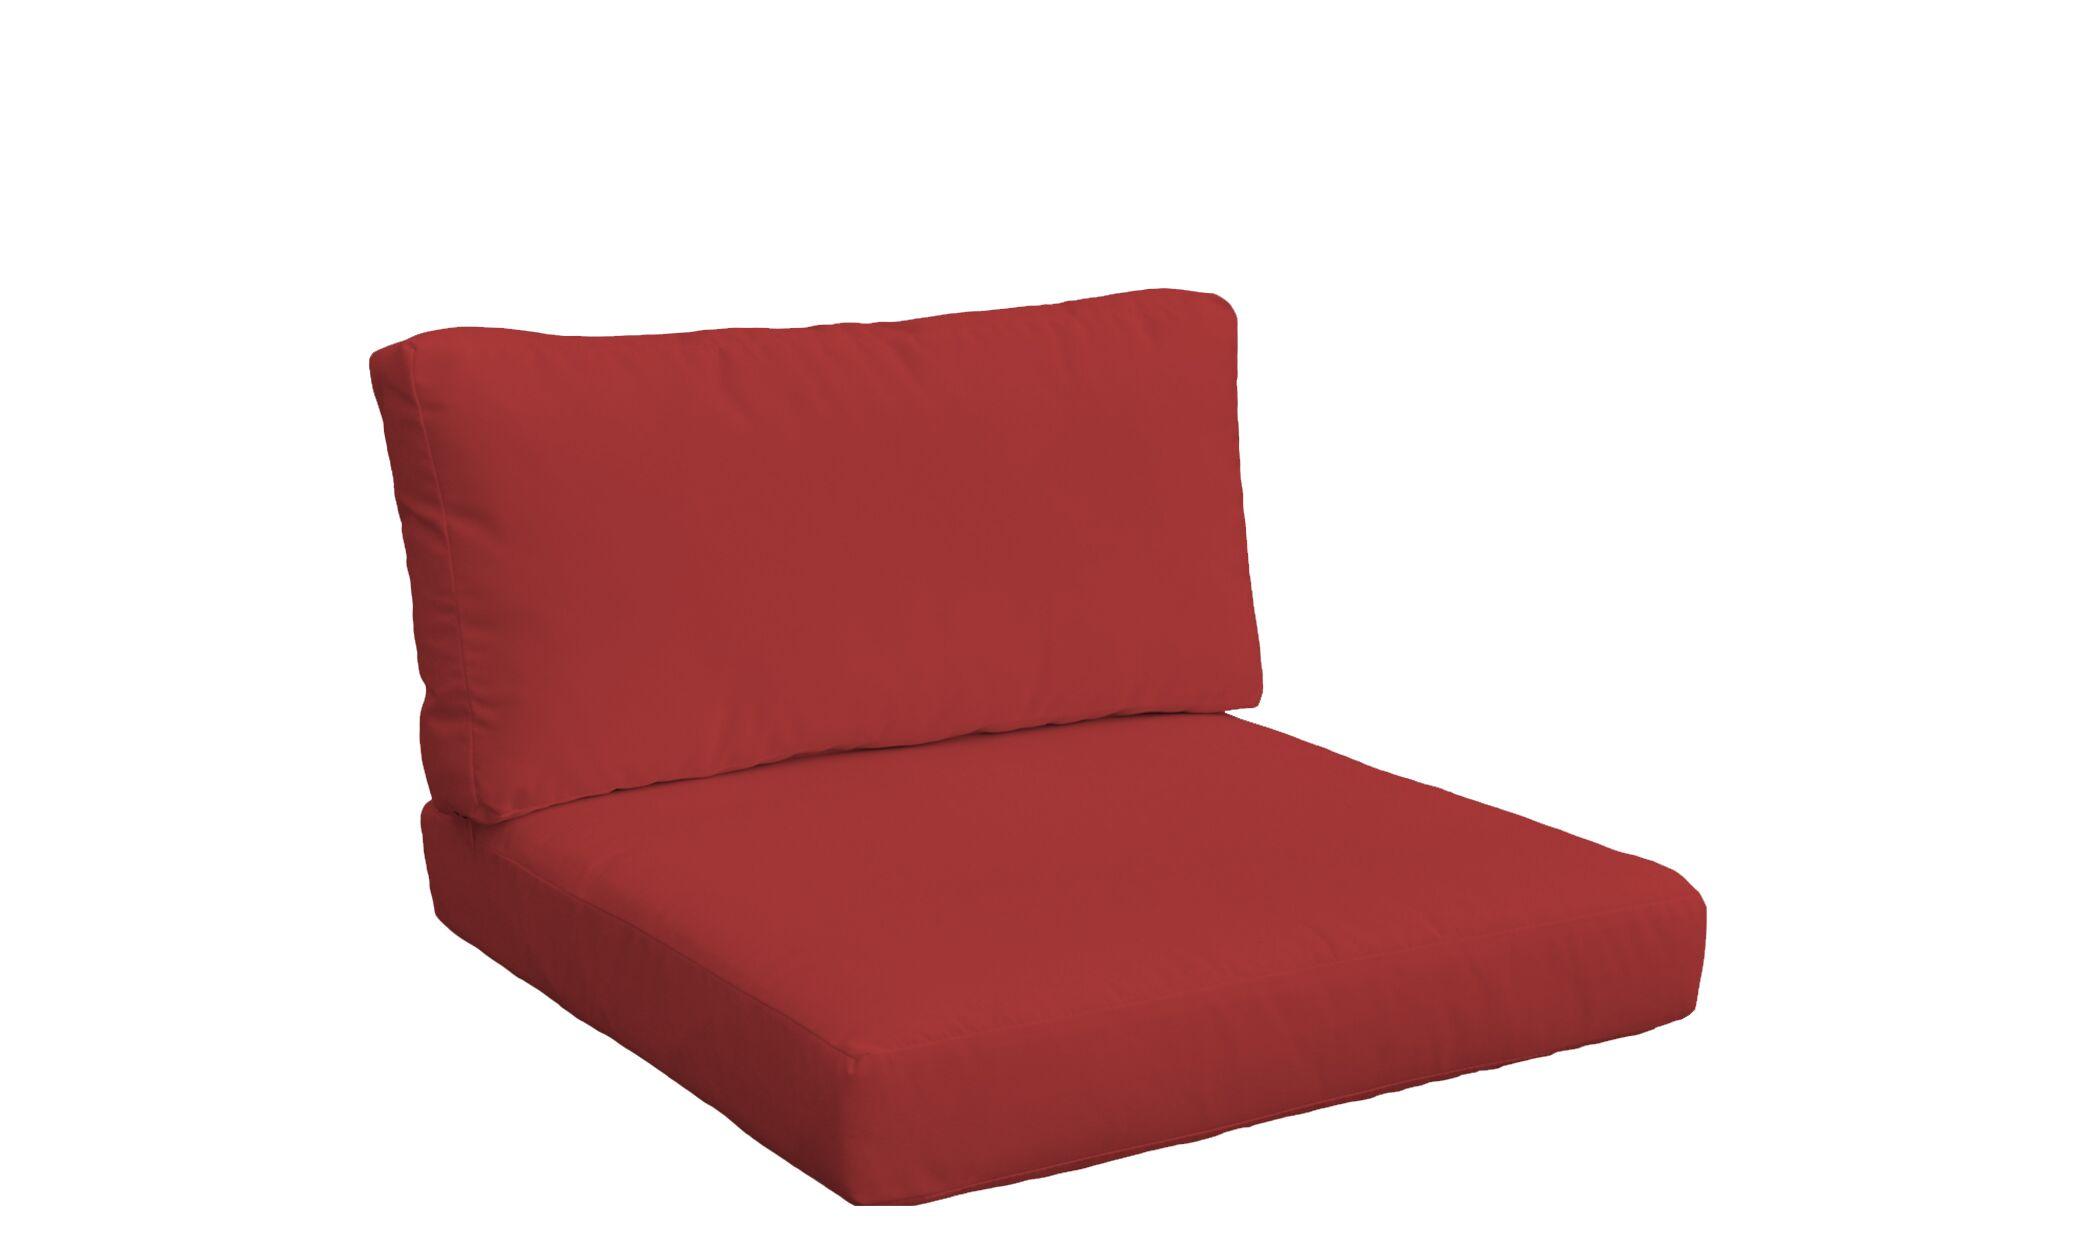 Monaco Outdoor 4 Piece Lounge Chair Cushion Set Fabric: Terracotta